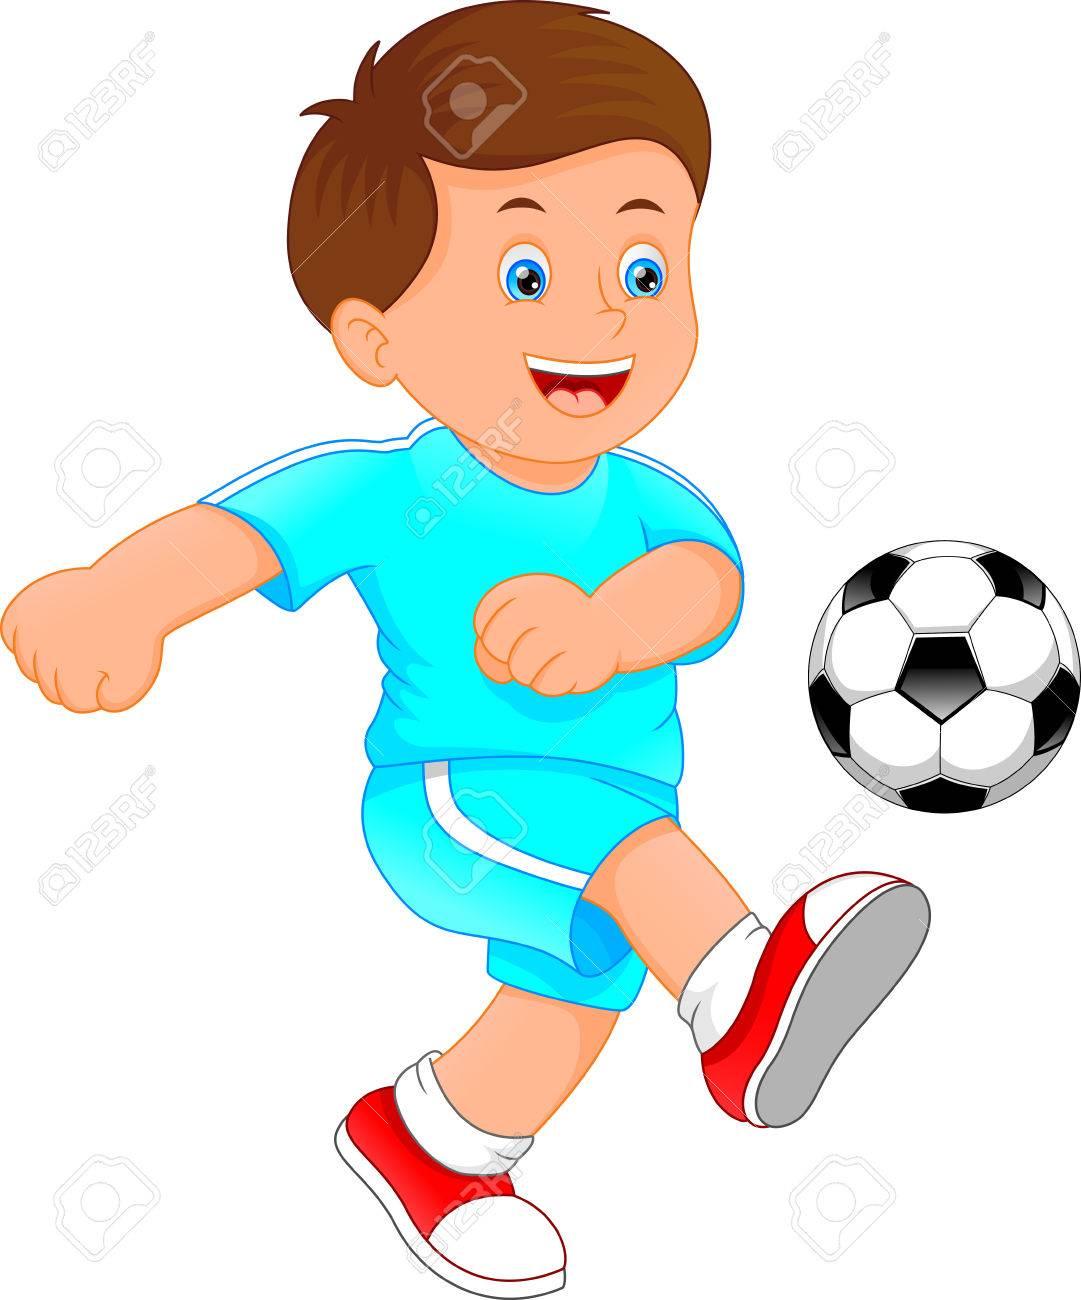 A cute little boy soccer player illustration..